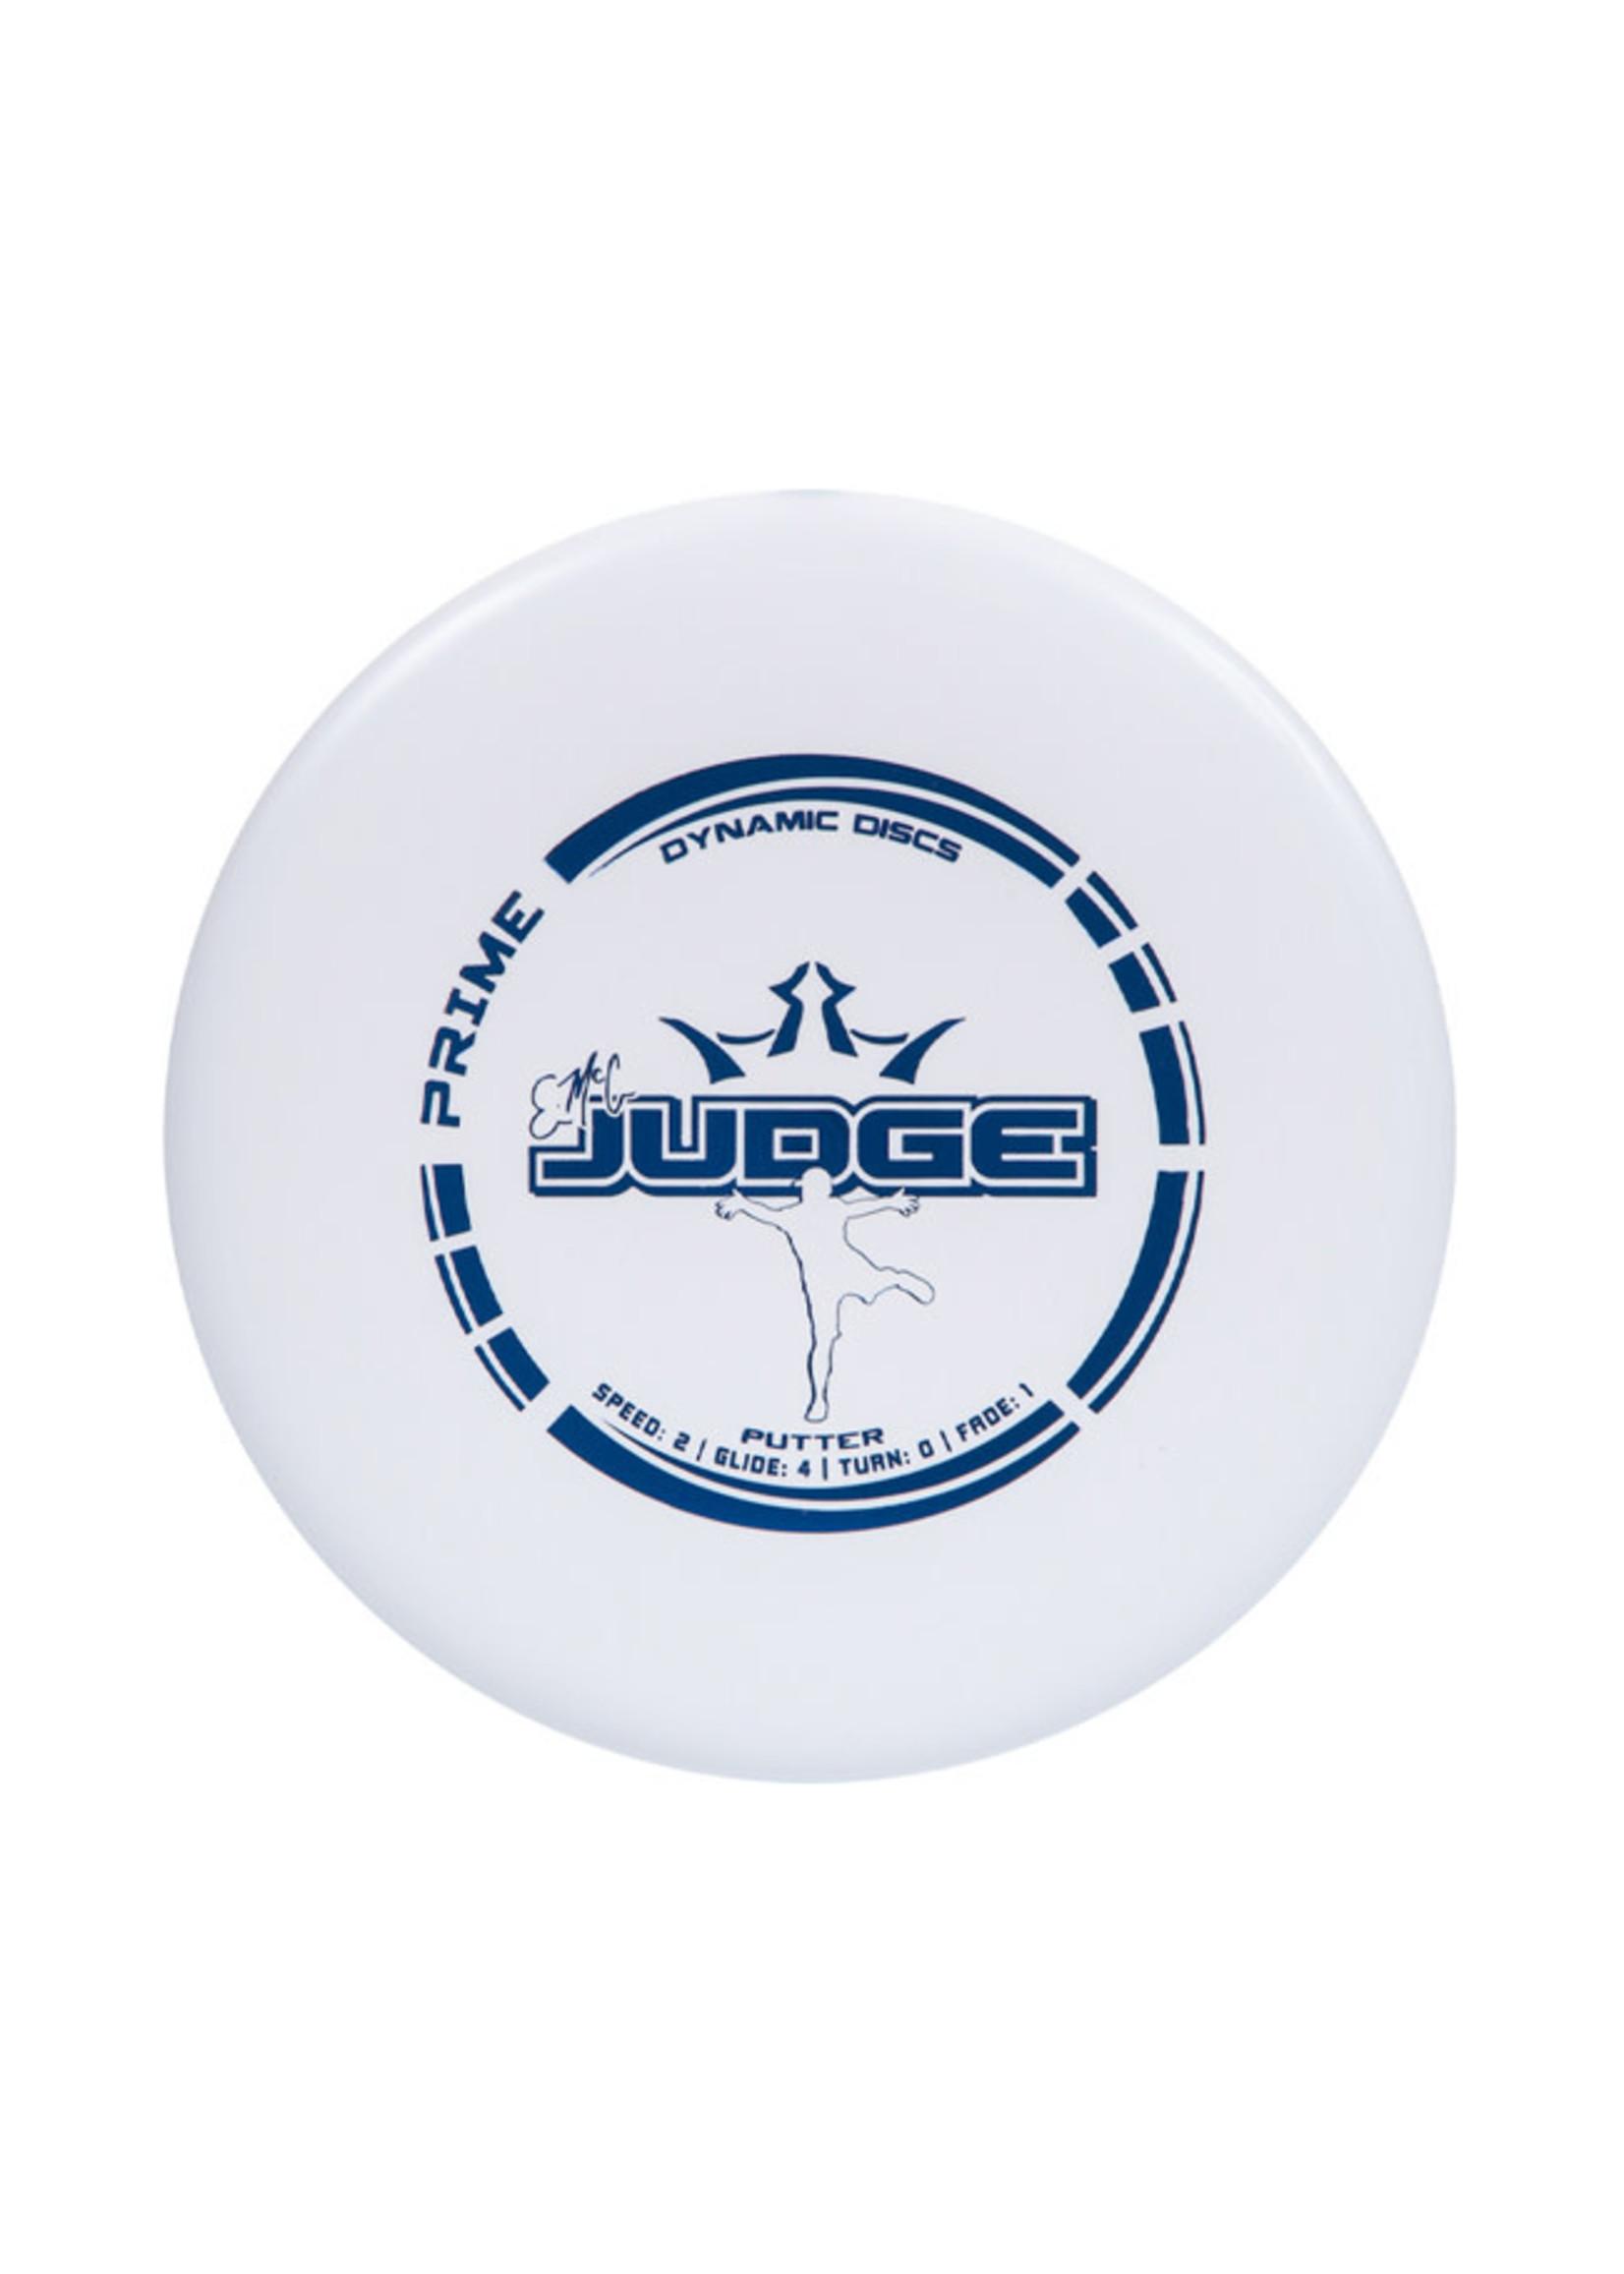 Dynamic Discs Dynamic Discs EMAC Judge Putter